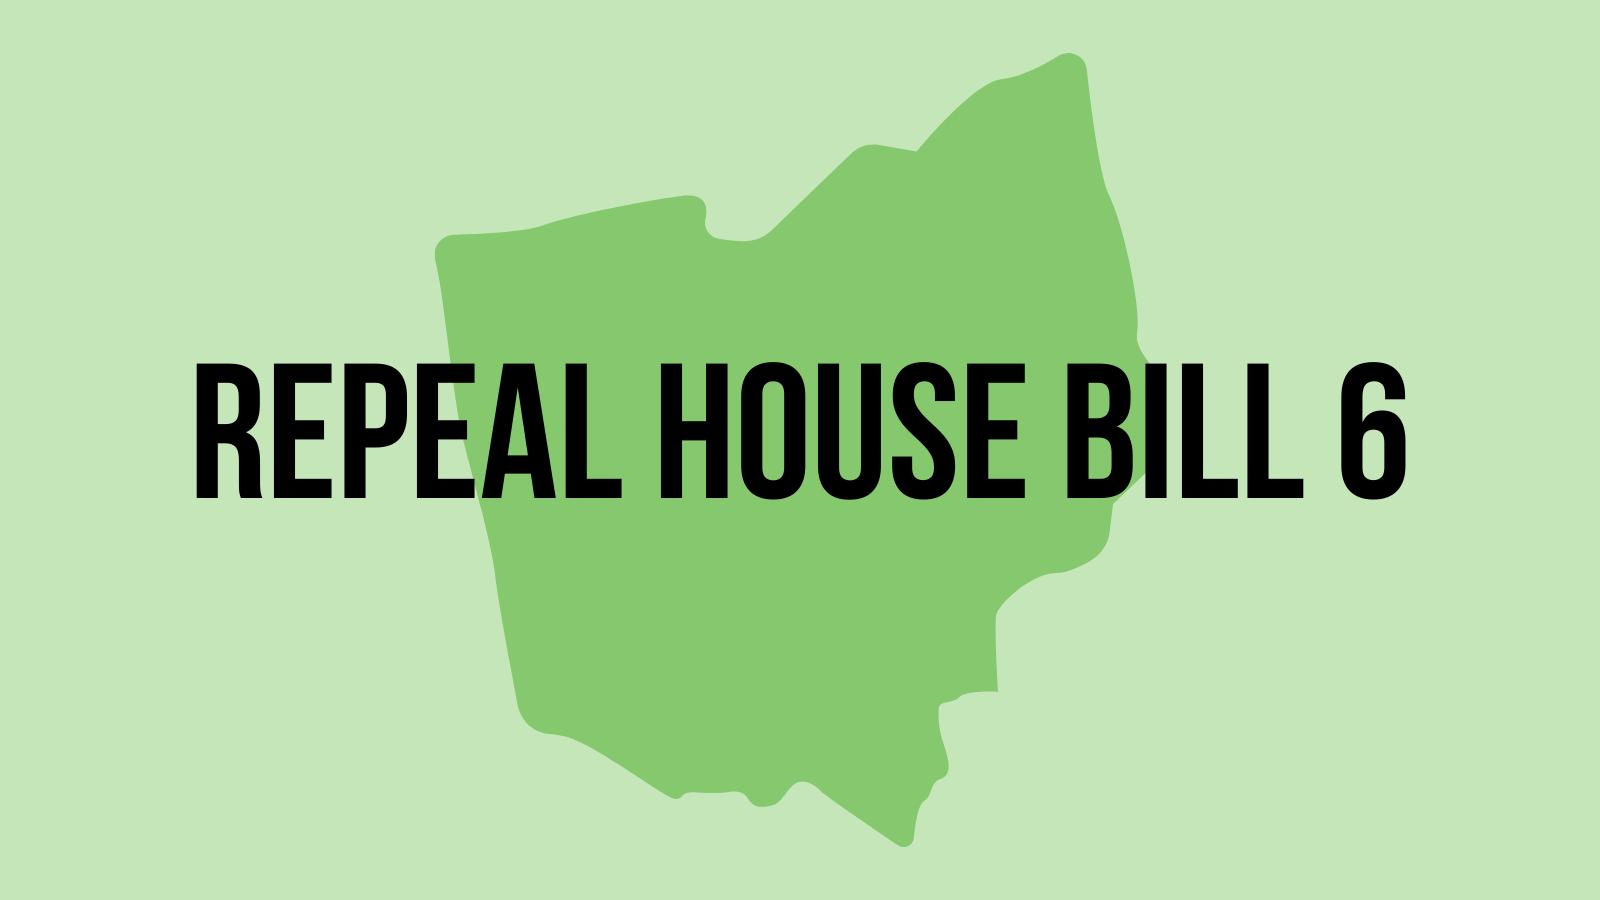 EEN Calls on Ohio Legislature to Repeal House Bill 6